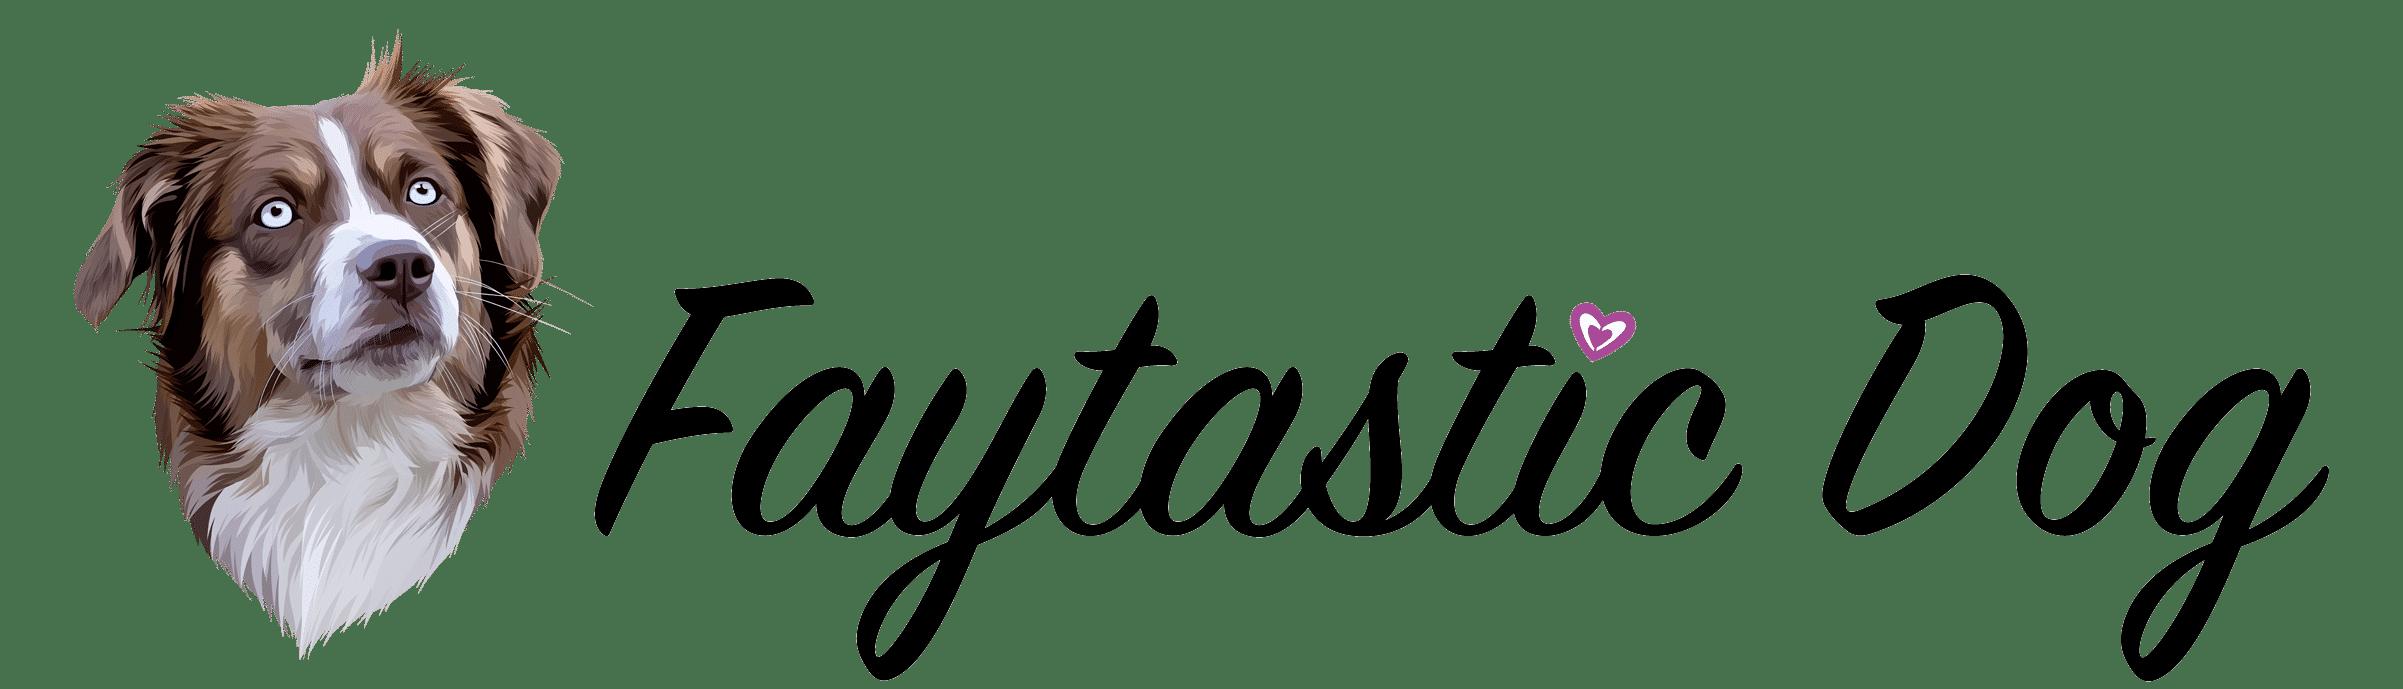 faytasticdog